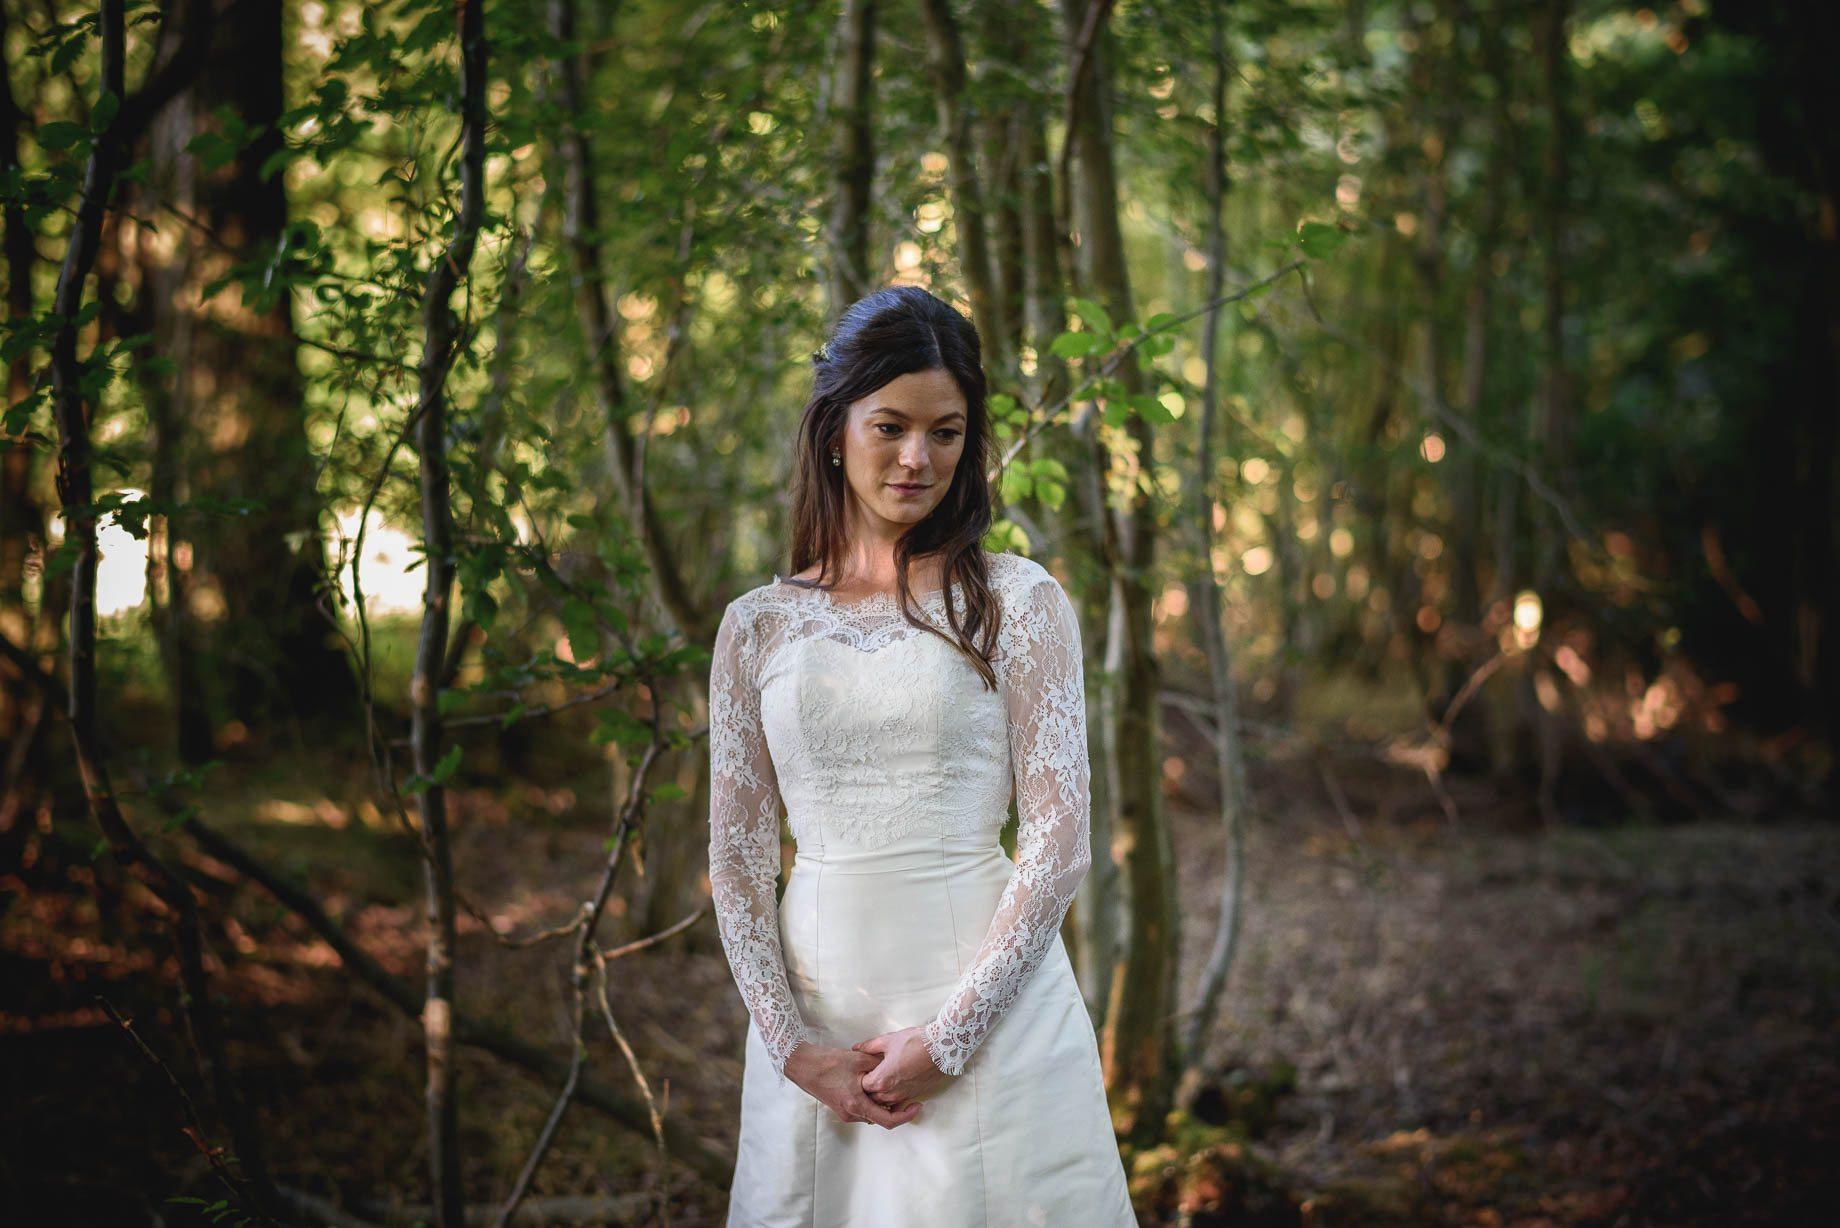 Gildings Barn wedding photography - Sarah and Steve (162 of 190)